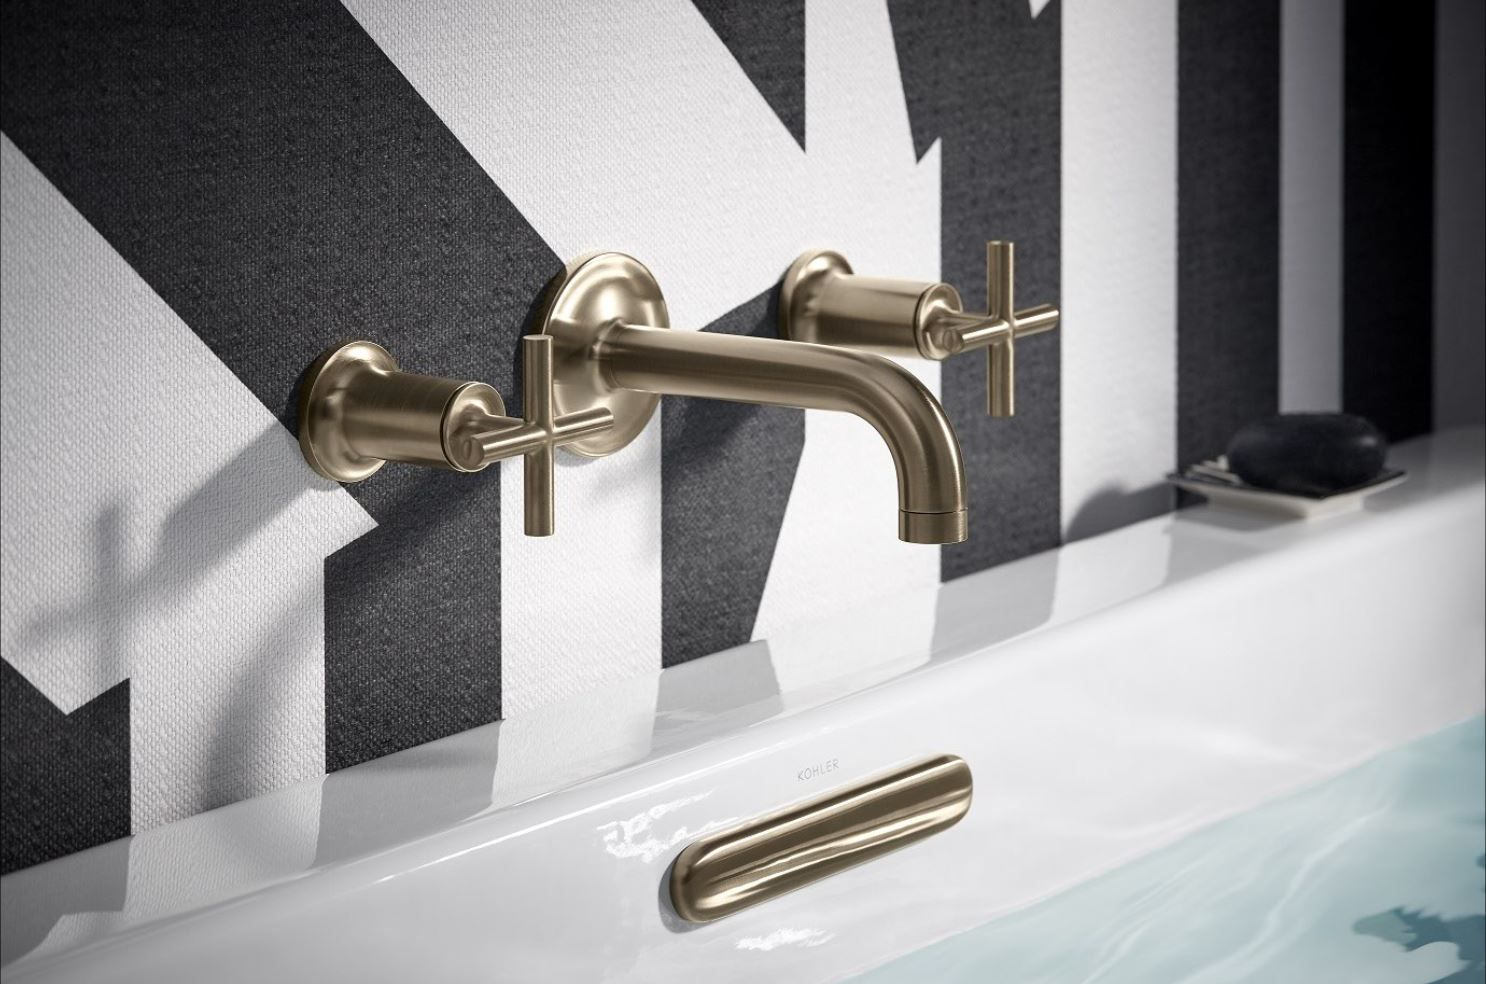 Kohler Purist Wall Mount Bath Filler Wall Mount Faucet Bathroom